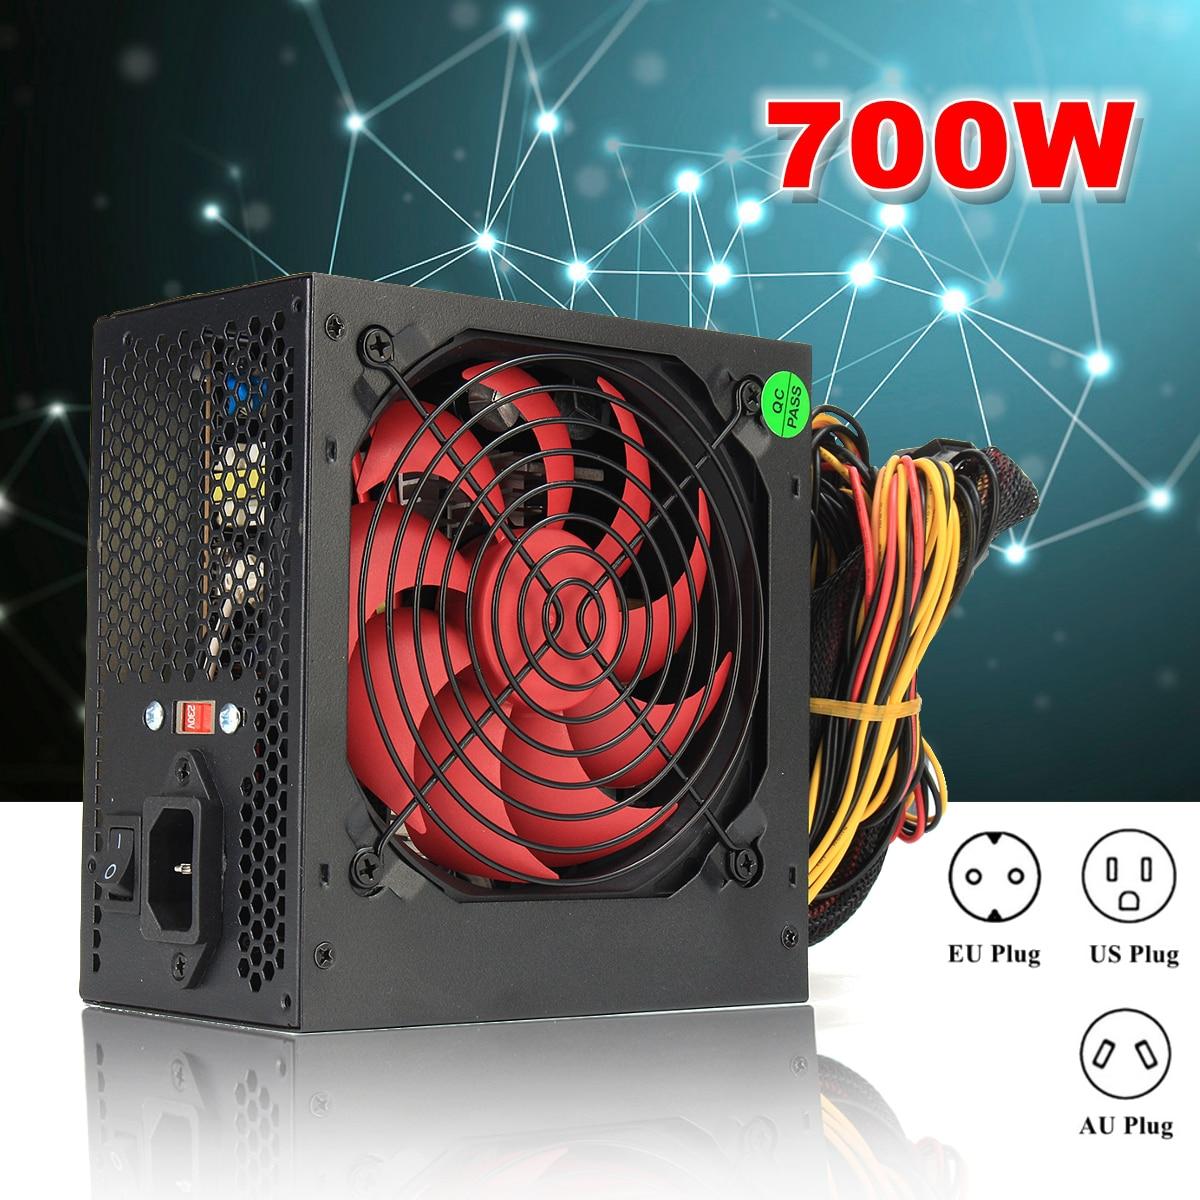 все цены на EU/AU/US Plug MAX 700W PCI SATA ATX 12V Gaming PC Power Supply 24Pin/Molex/Sata 700Walt 12CM Fan Computer Power Supply For BTC онлайн